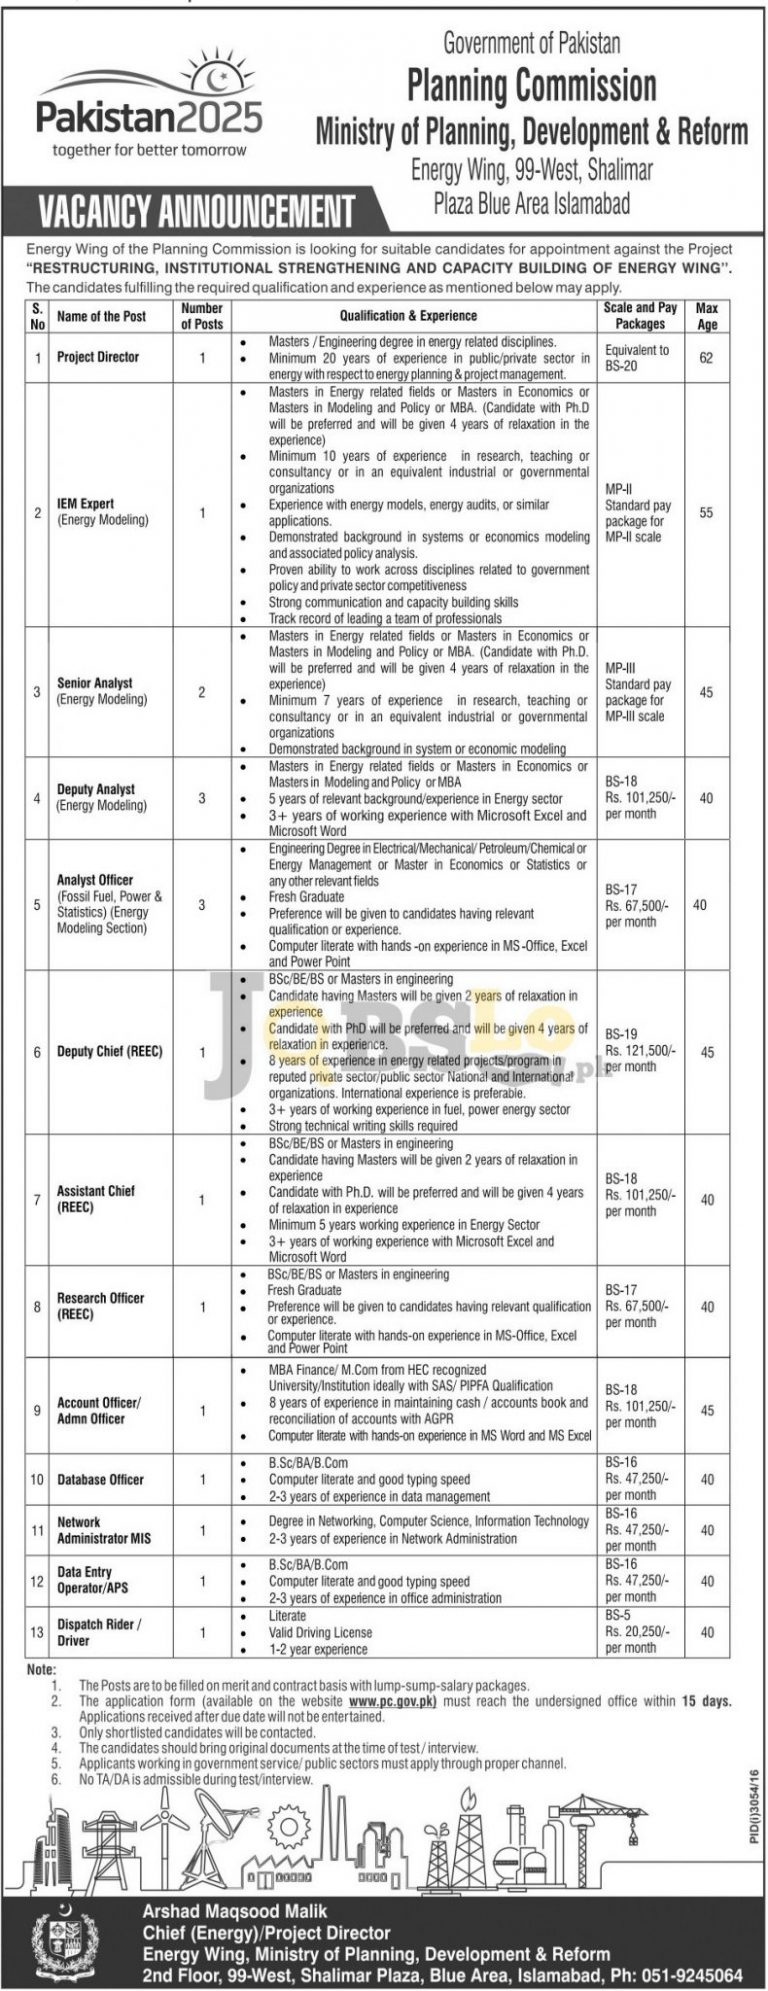 Planning Commission of Pakistan Jobs 2016-17 Application Form Download pc.gov.pk